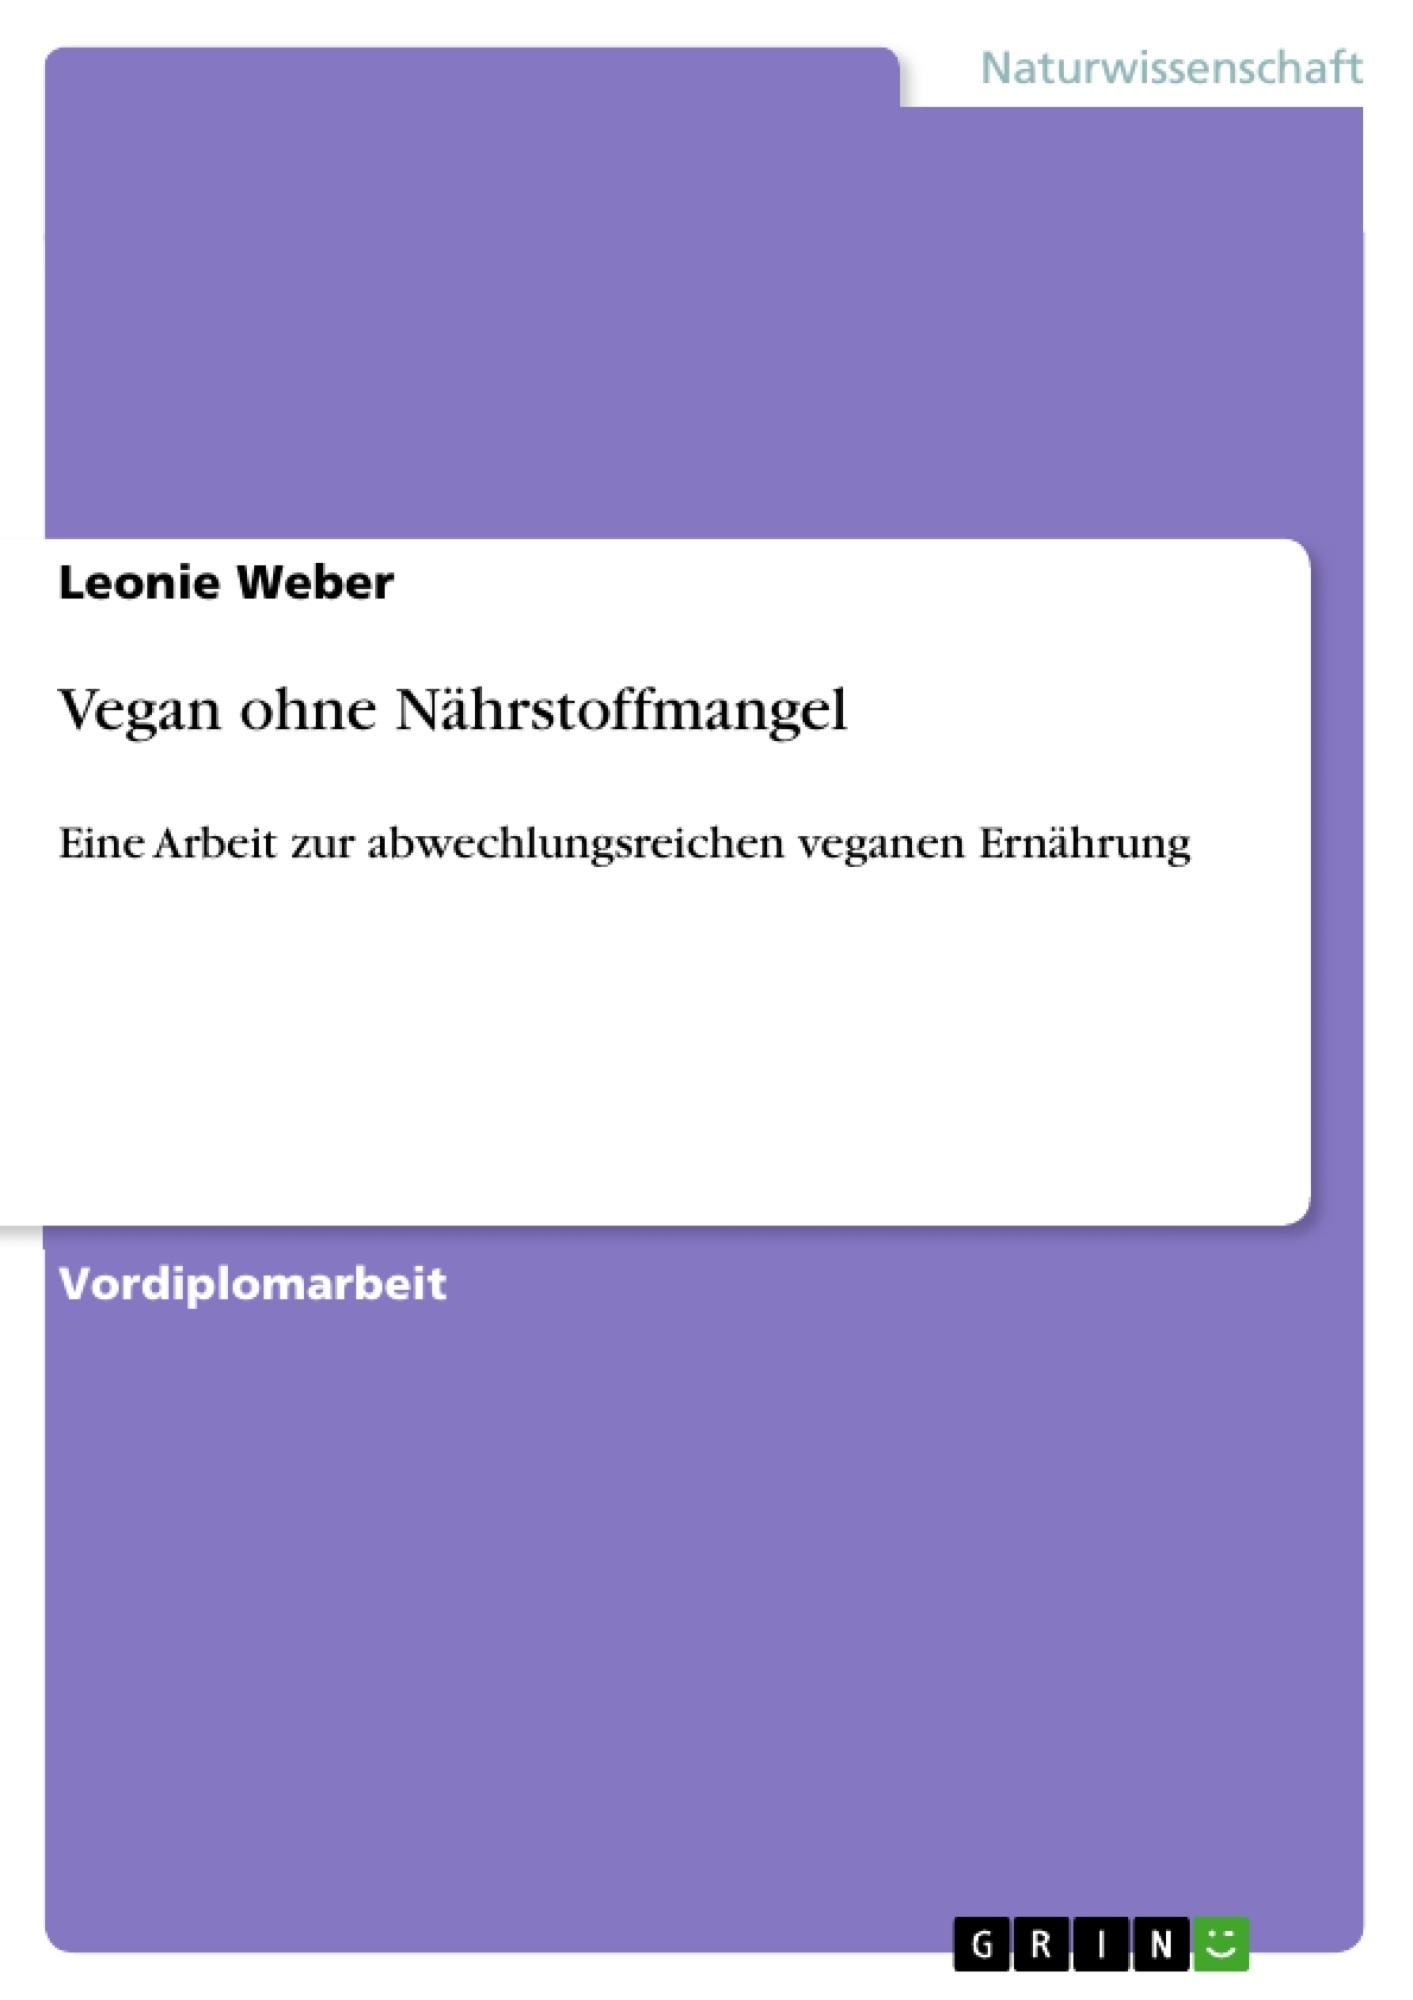 Titel: Vegan ohne Nährstoffmangel